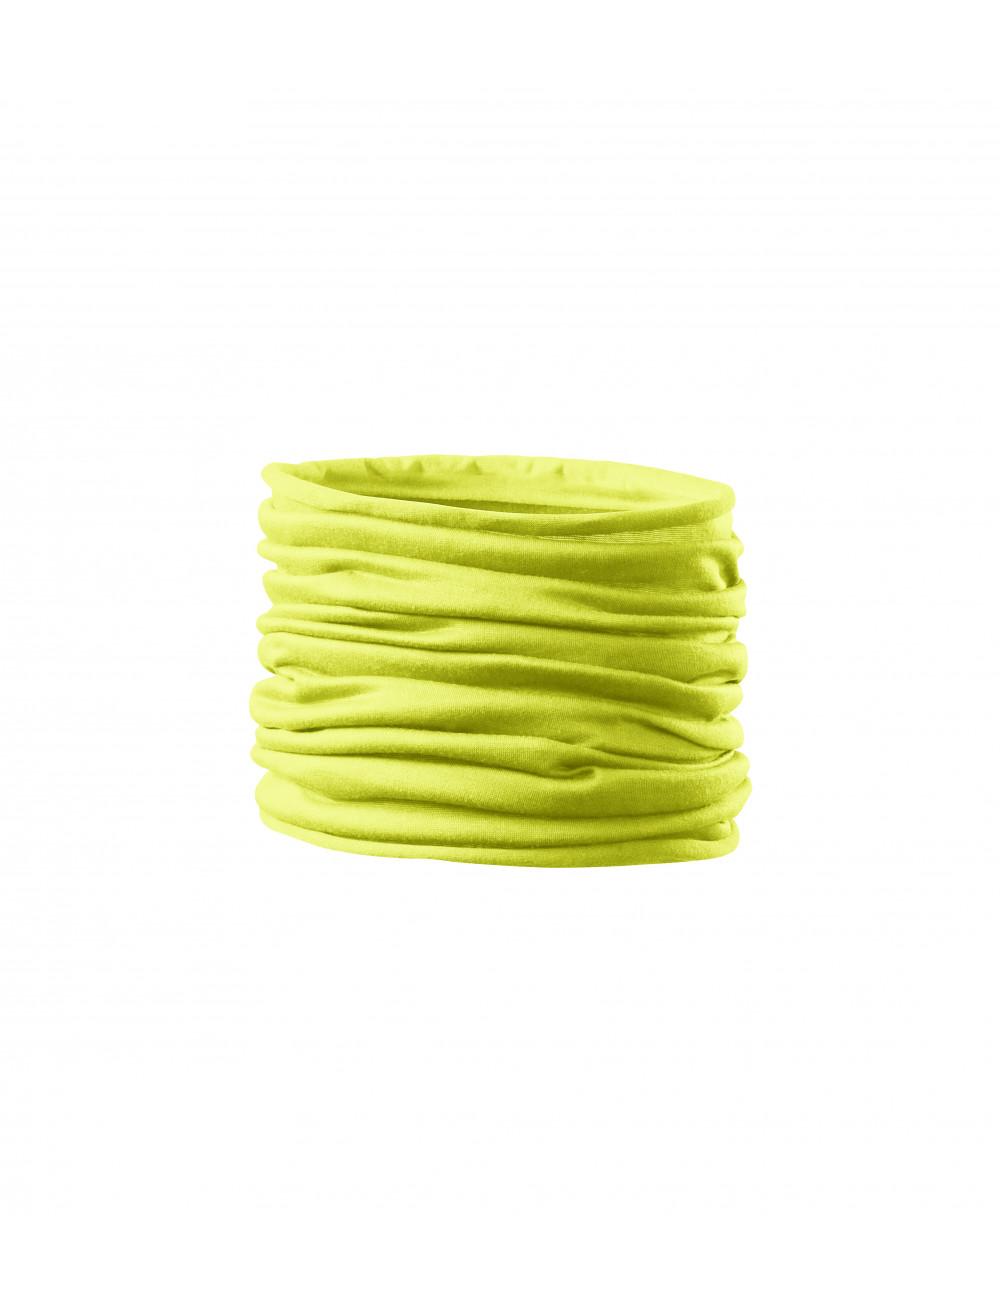 Adler MALFINI Scarf Unisex/Kids Twister 328 neon yellow